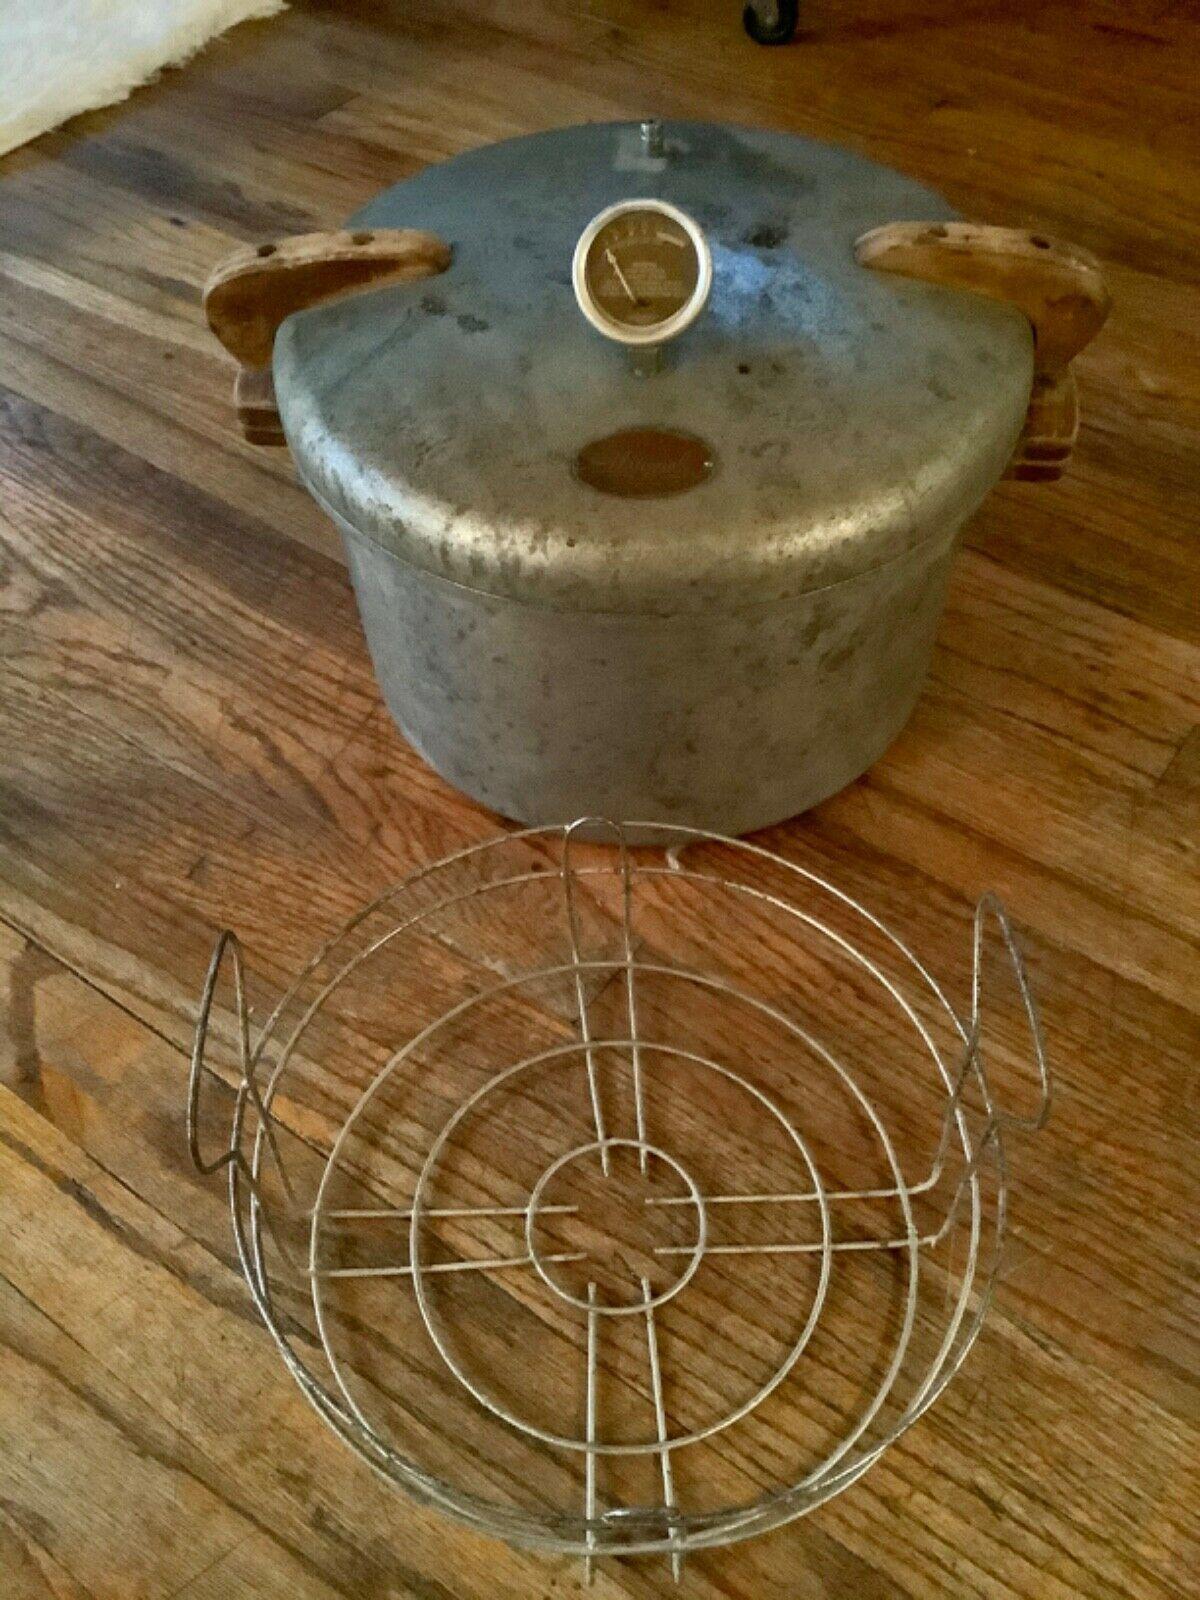 Vintage Heavy Duty PRESTO 16 Qt quart Cooker Canner  Model No. 7 w/ wire basket - $125.00